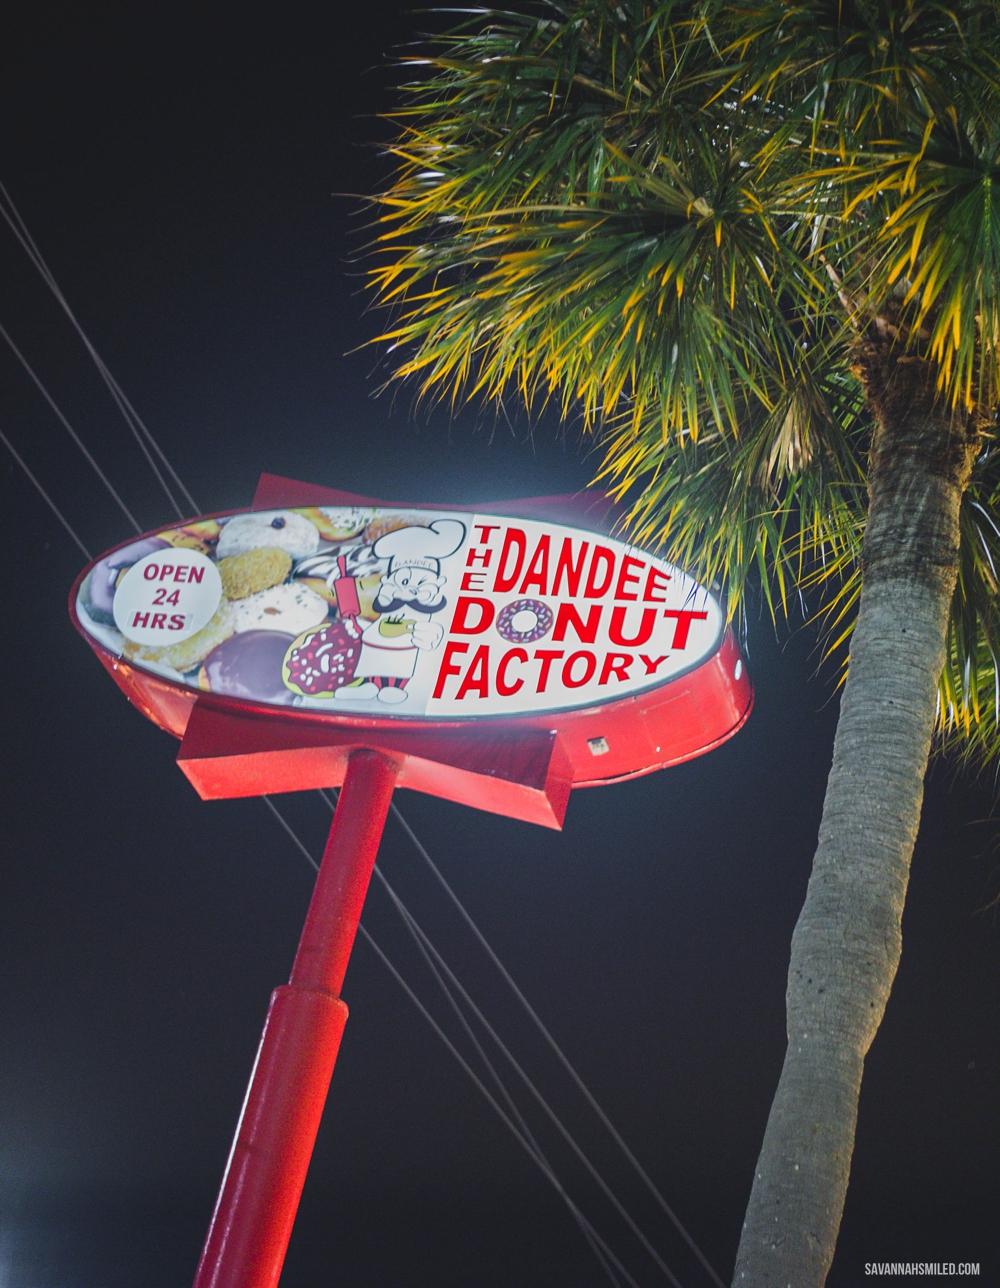 dandee-donuts-pampano-beach-fort-lauderdale-florida-10.jpg